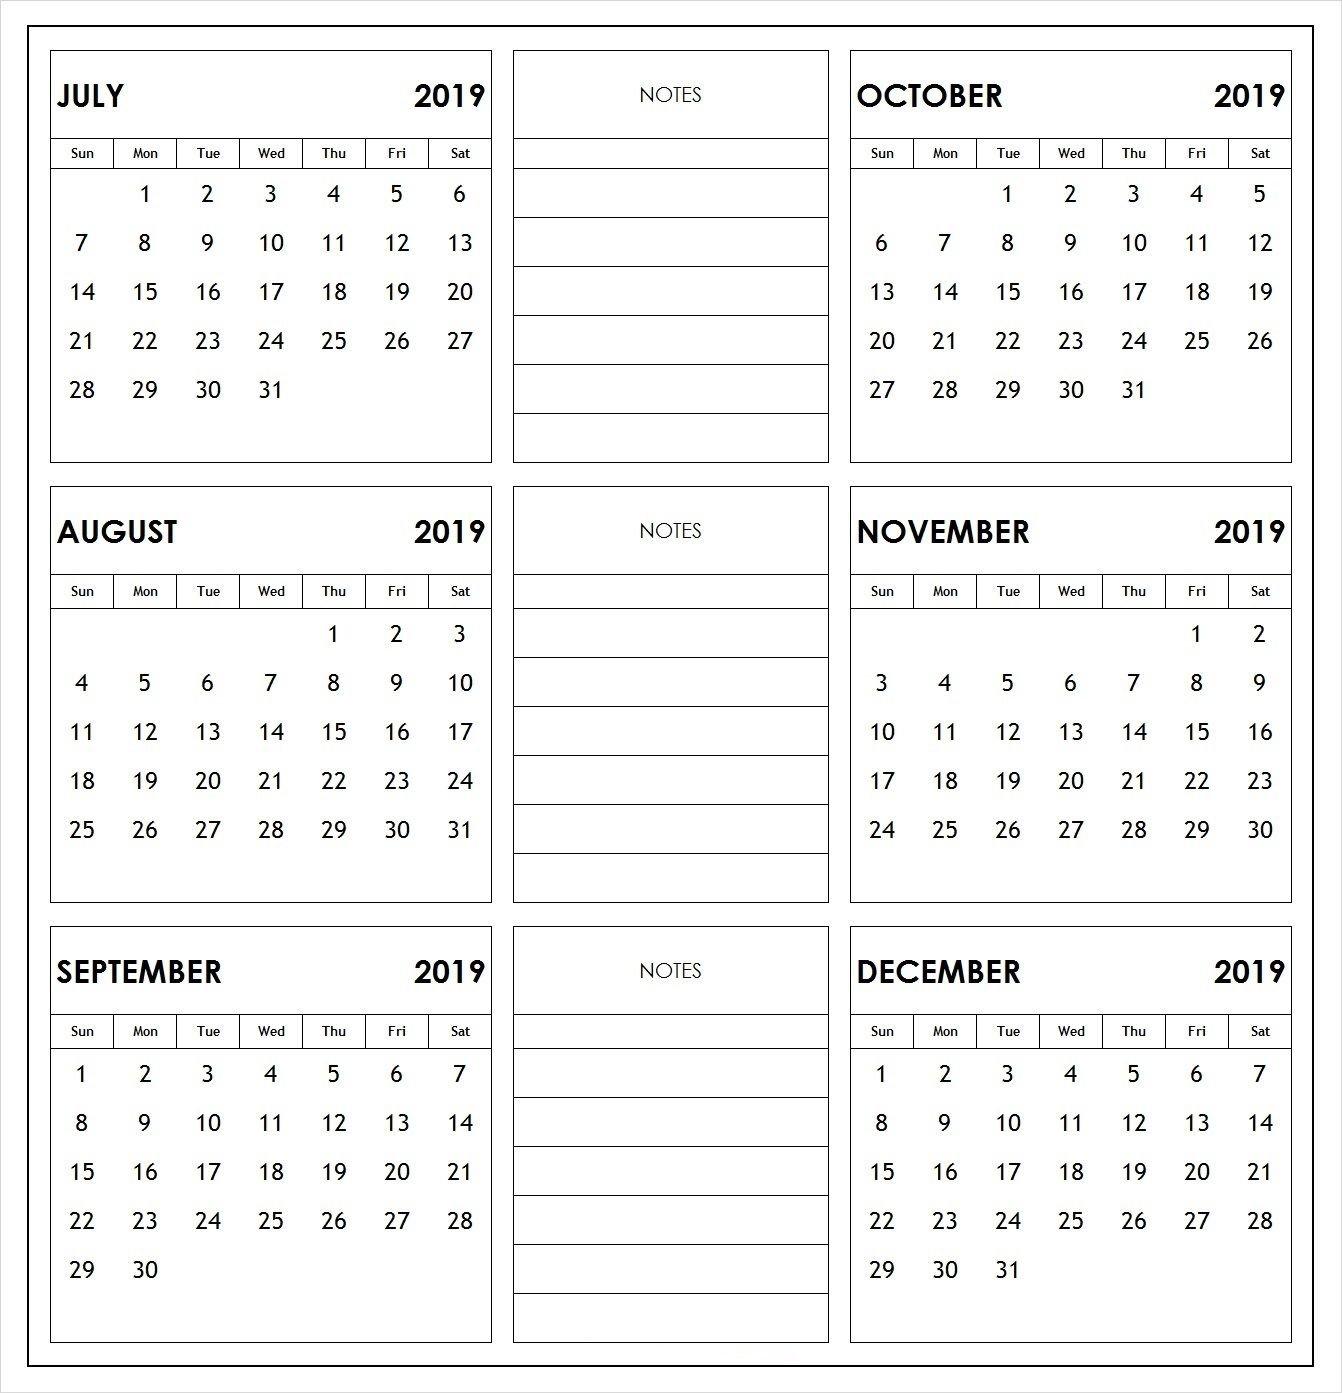 2019 Half Year Print Calendar | 2019 Calendars | Academic Calendar Calendar 2019 6 Months